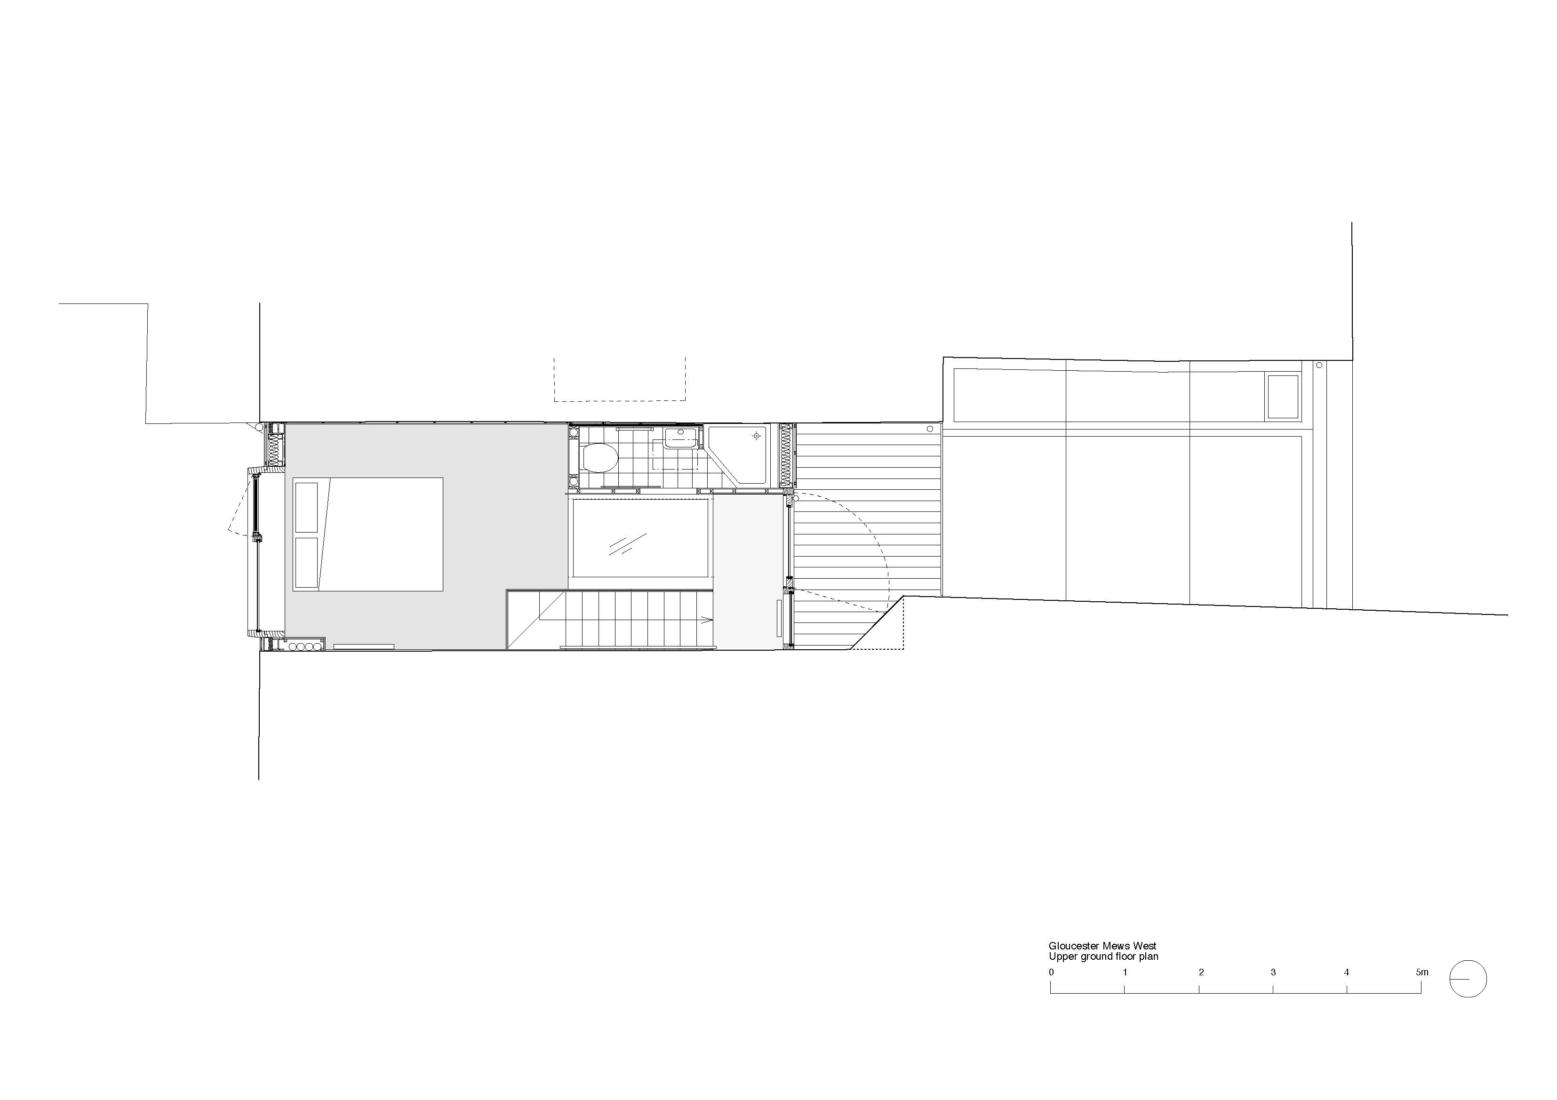 Gloucester Mews West upper ground floor plan